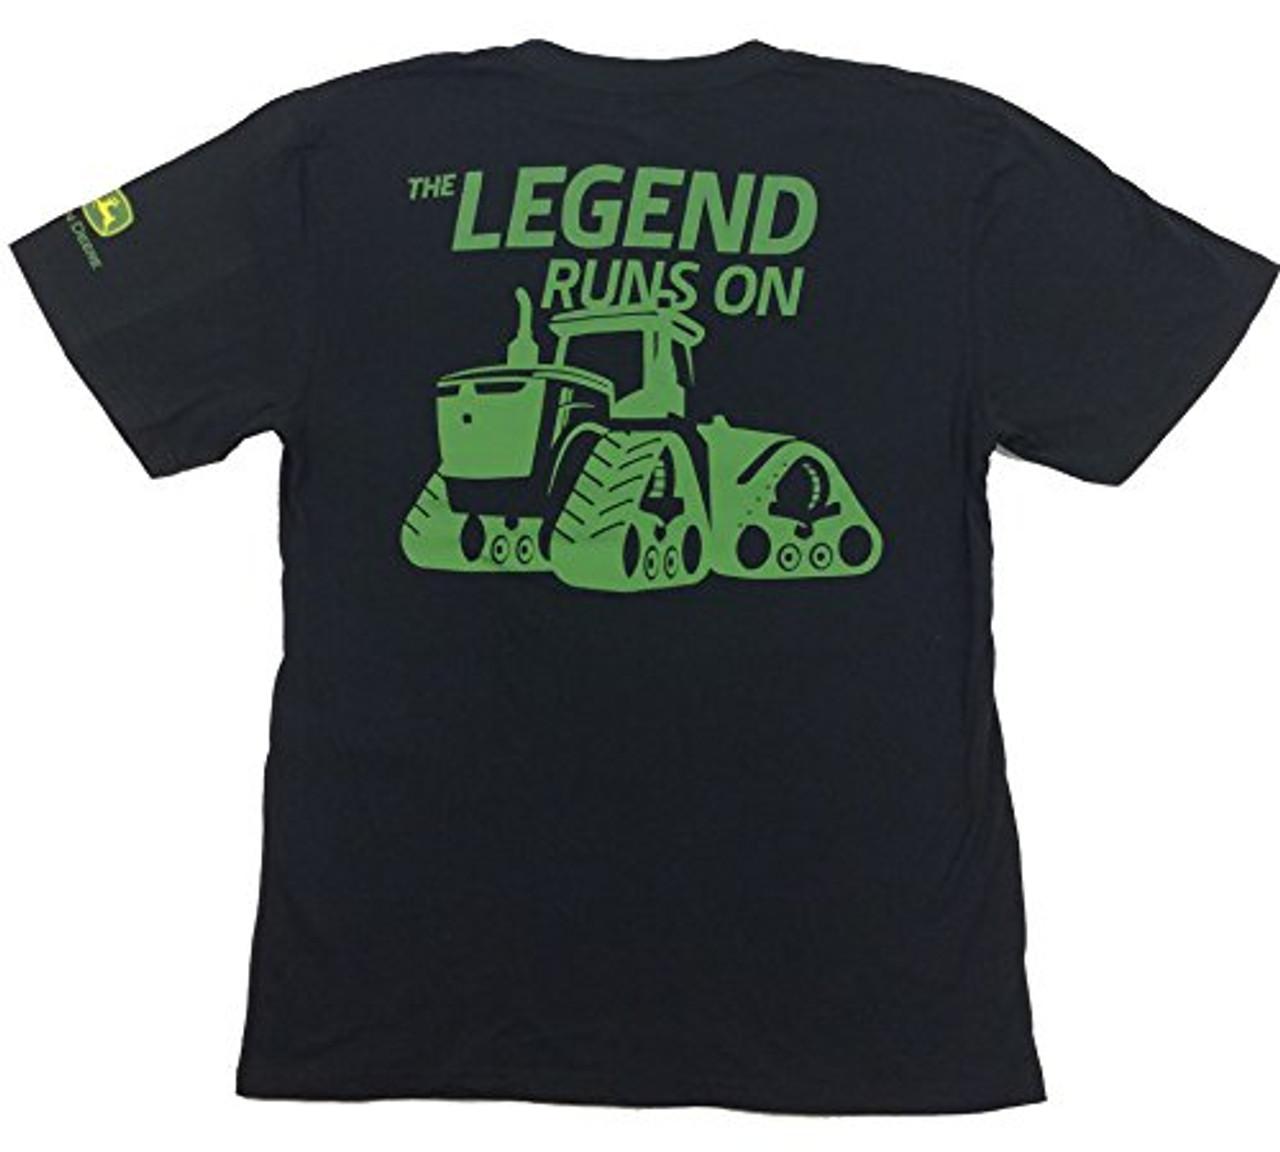 John Deere Limited Edition 100th Anniversary Tractor Legend T-shirt - Trenz  Shirt Company 400b047b61fc